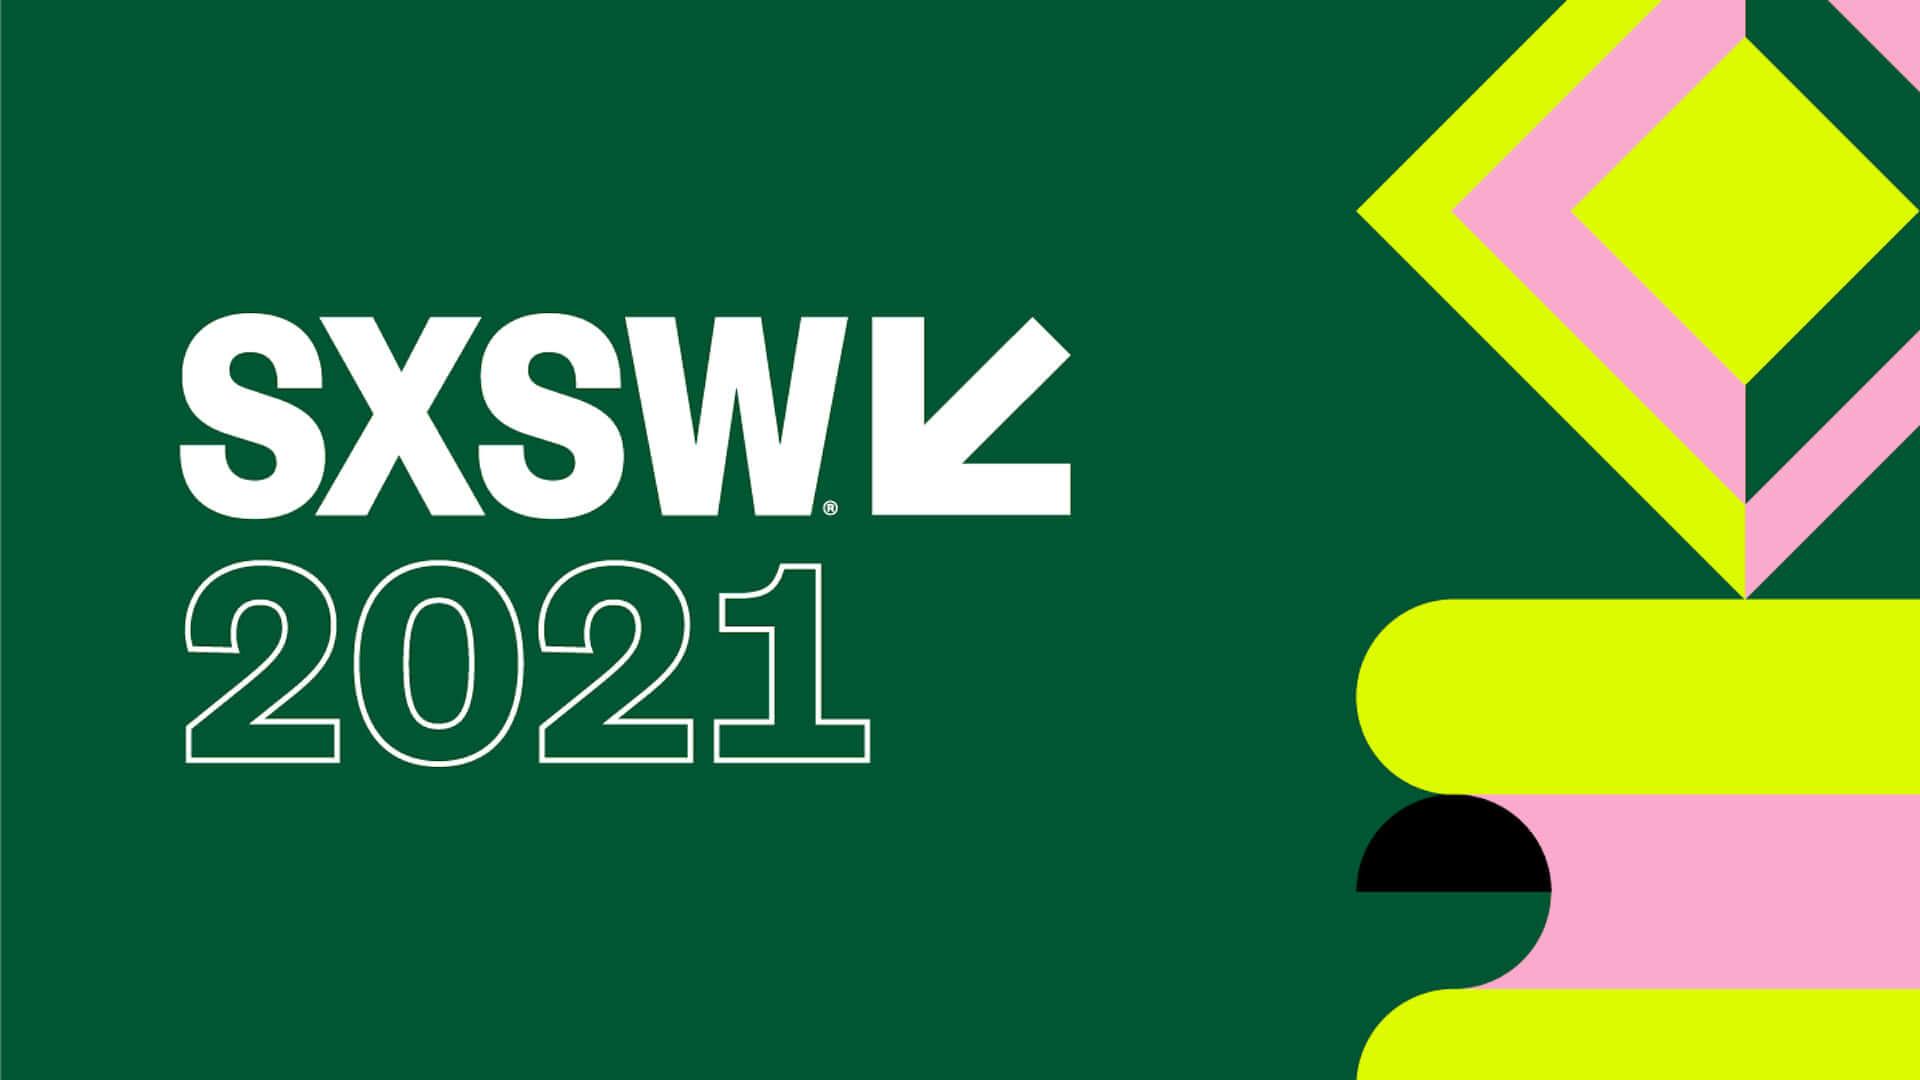 <SXSW 2021>がオンラインで開催決定!映画祭とカンファレンスセッションの一般公募もスタート art201007_sxsw-online_2-1920x1080